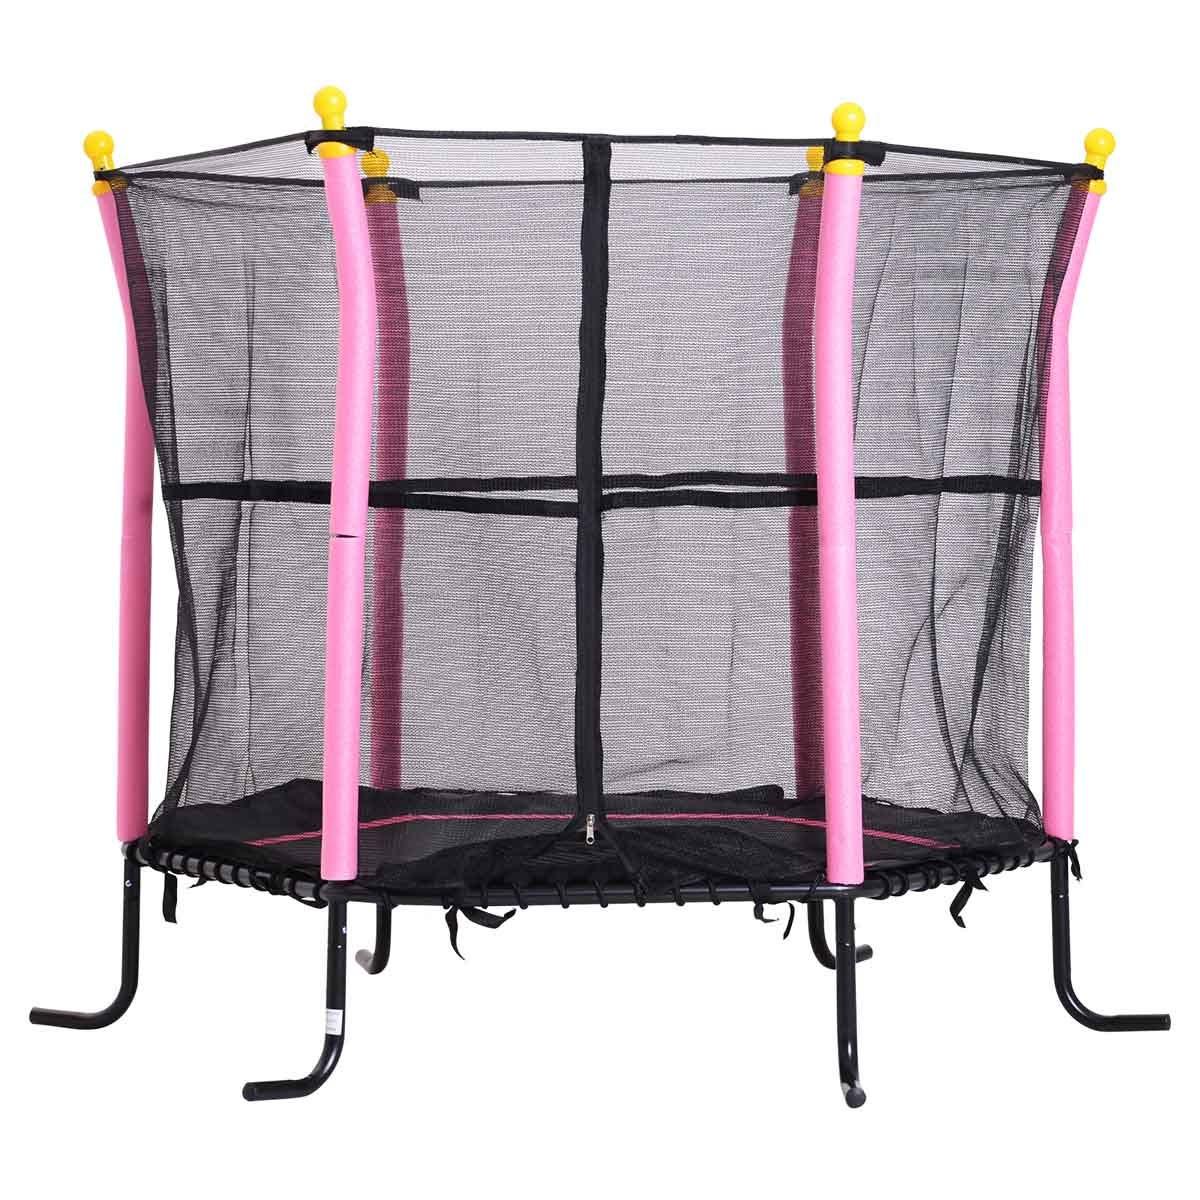 Jouet Childrens Mini Trampoline with Enclosure Net